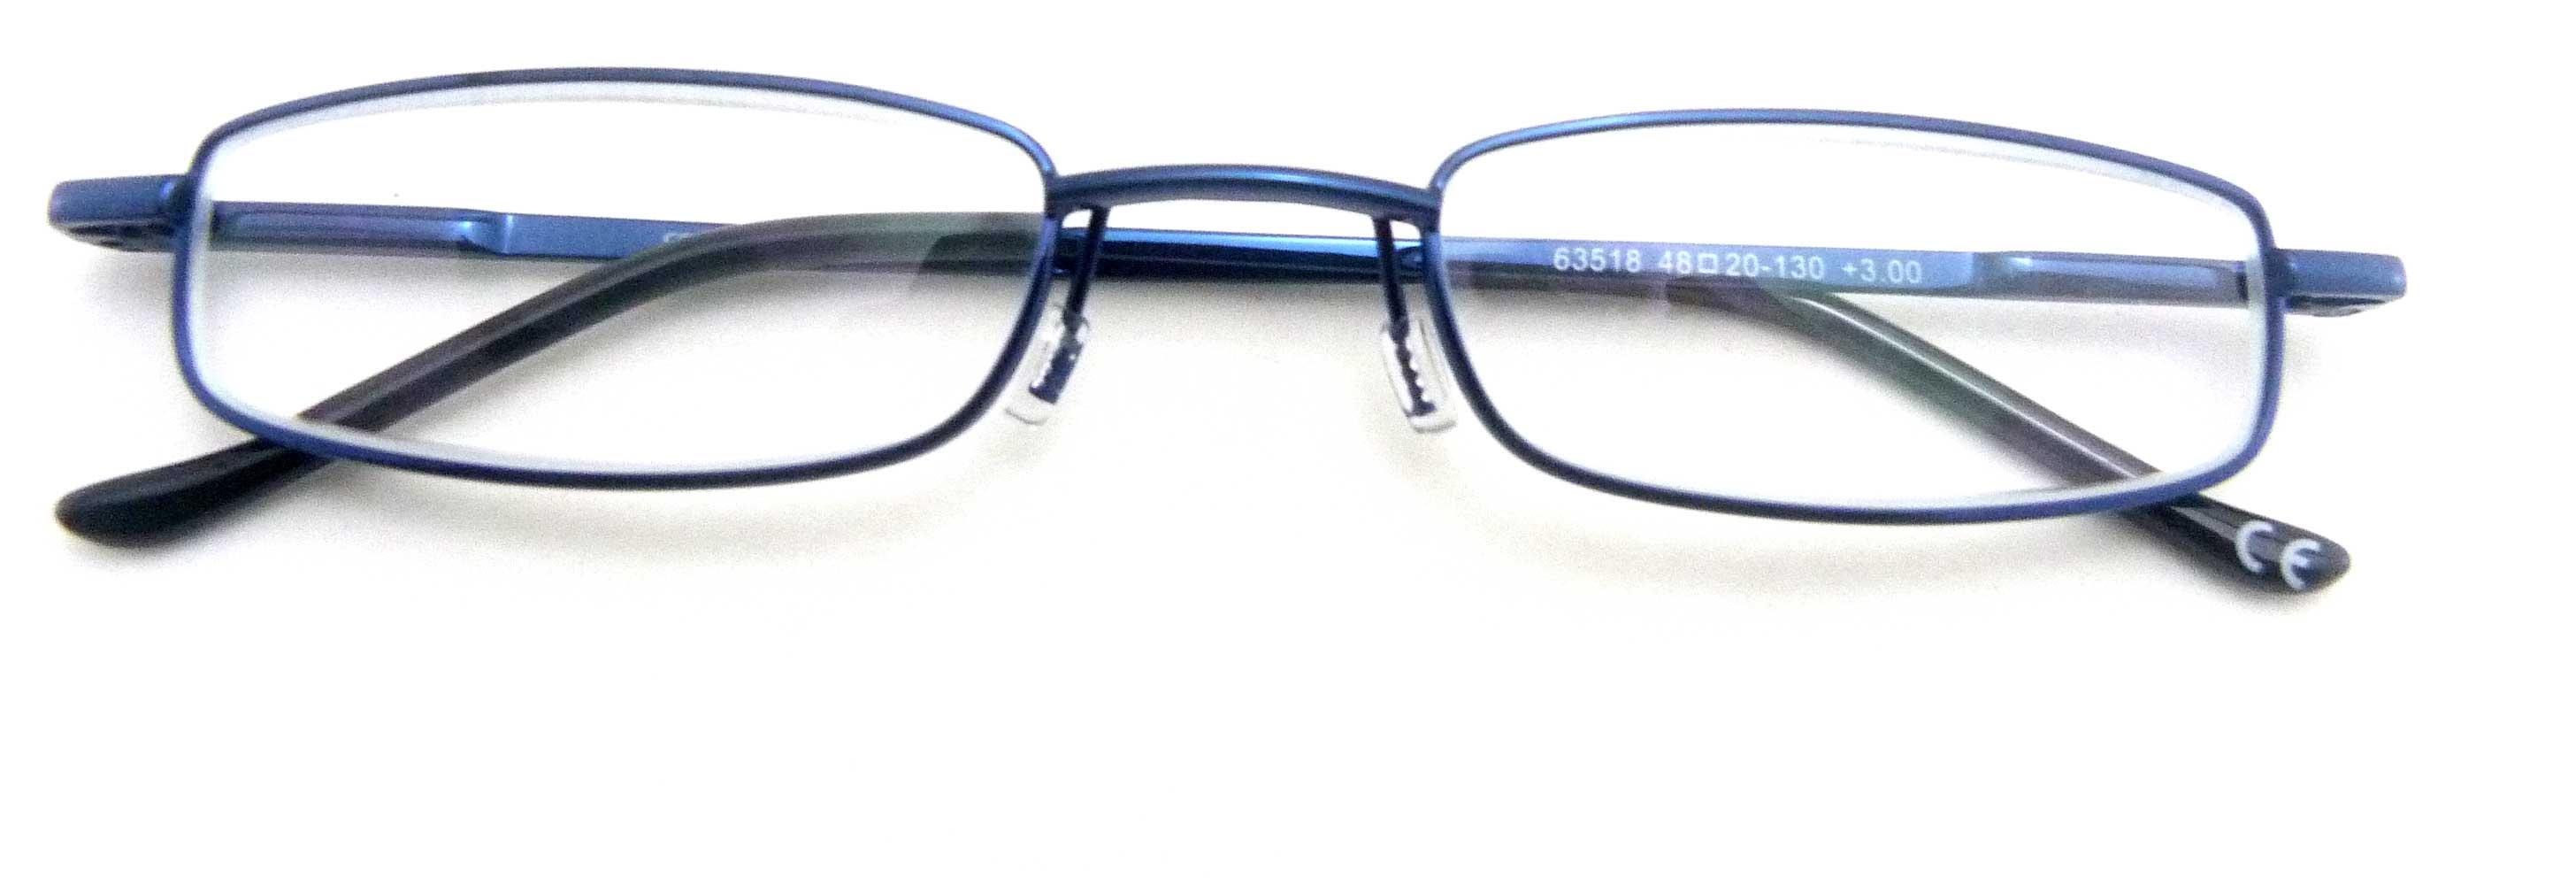 0263518 - Óculos Leitura Flex AT +3,00 Azul Mod 63518 FLAG 9  -Contém 1 Peça